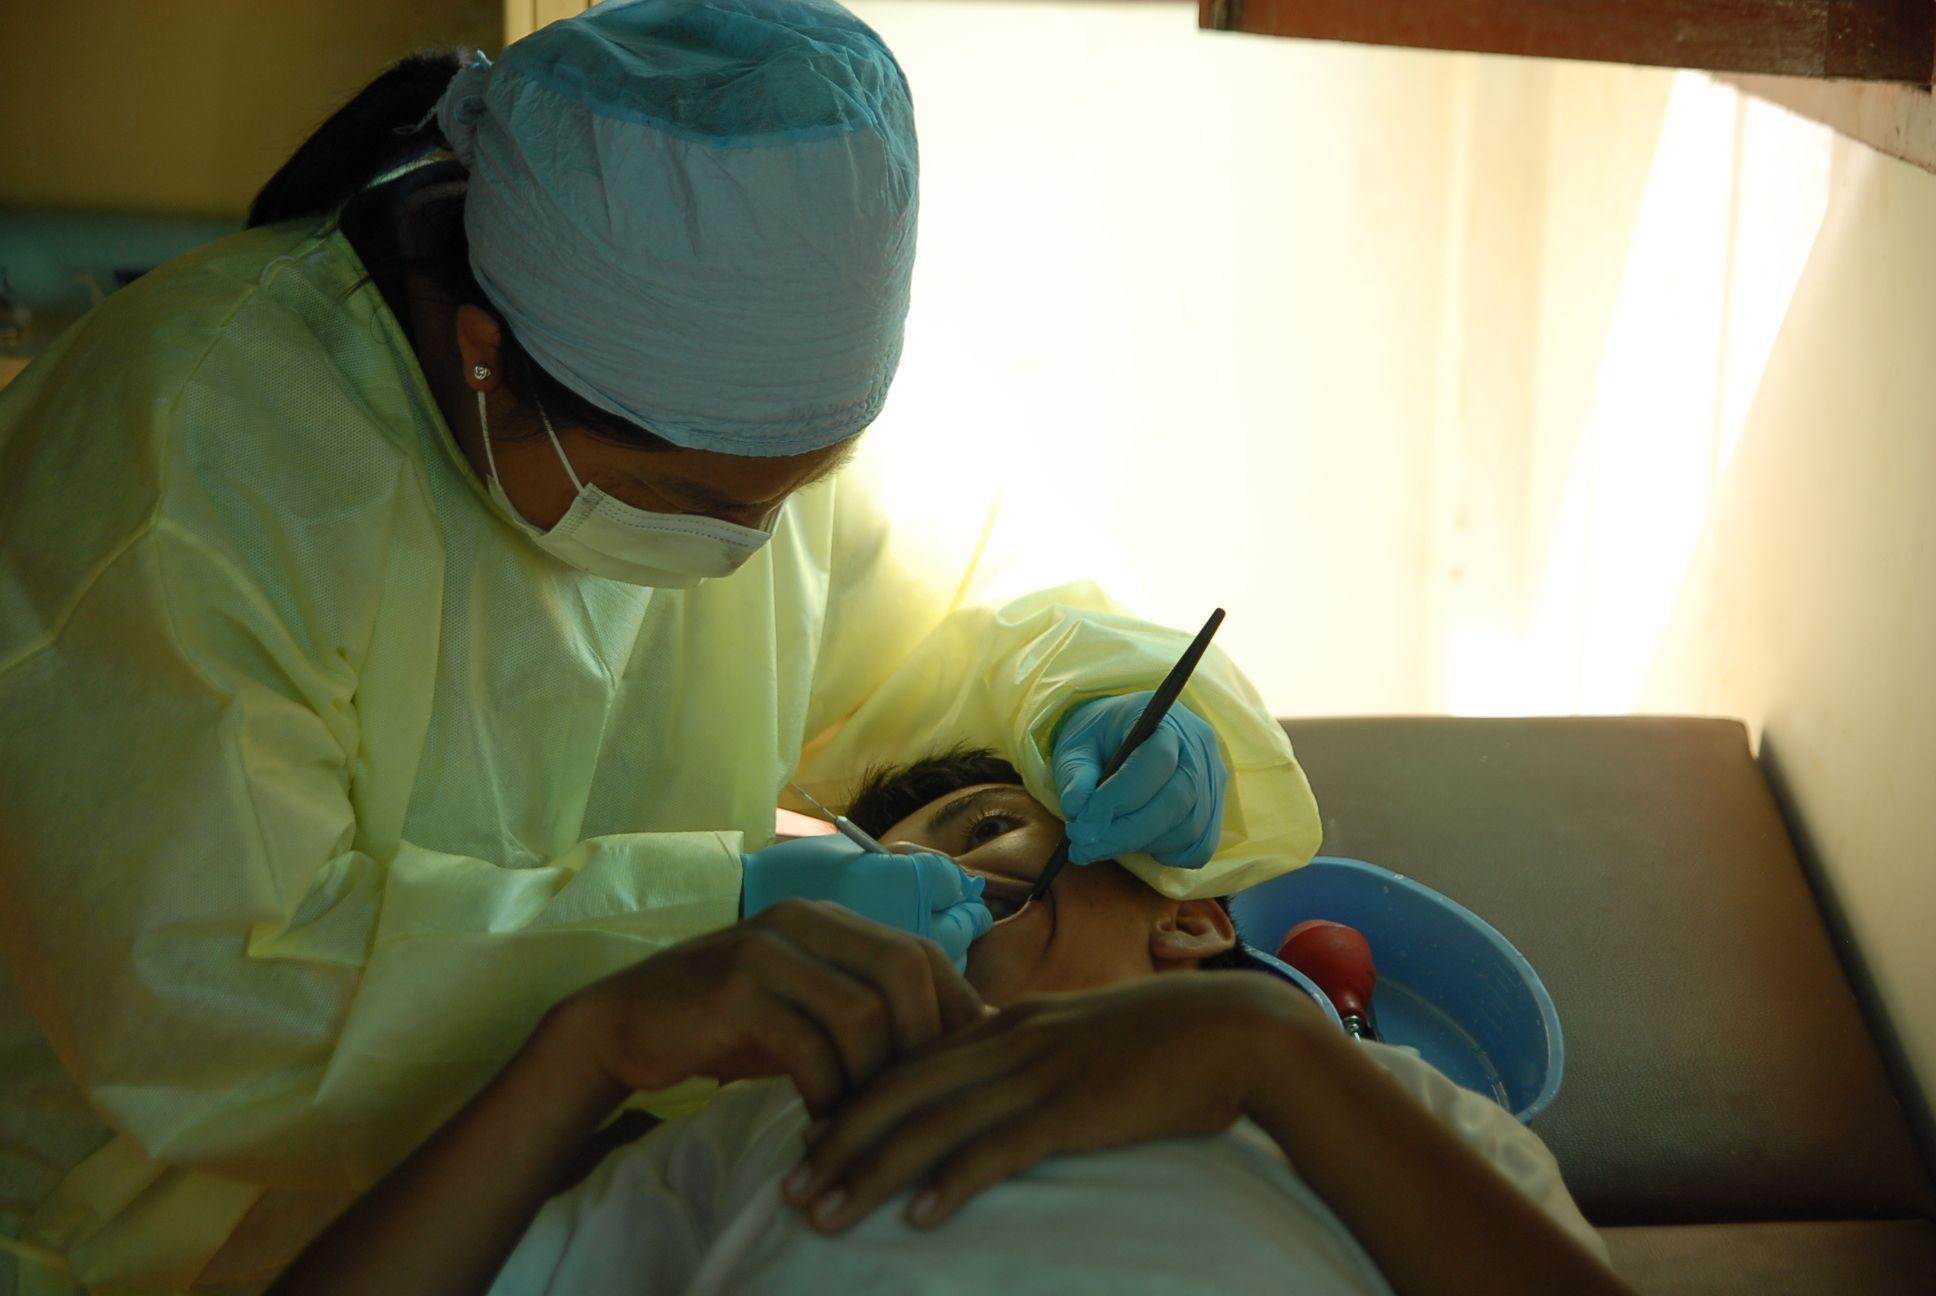 Dental care at the Jornada de Salud (Mobile Clinic)